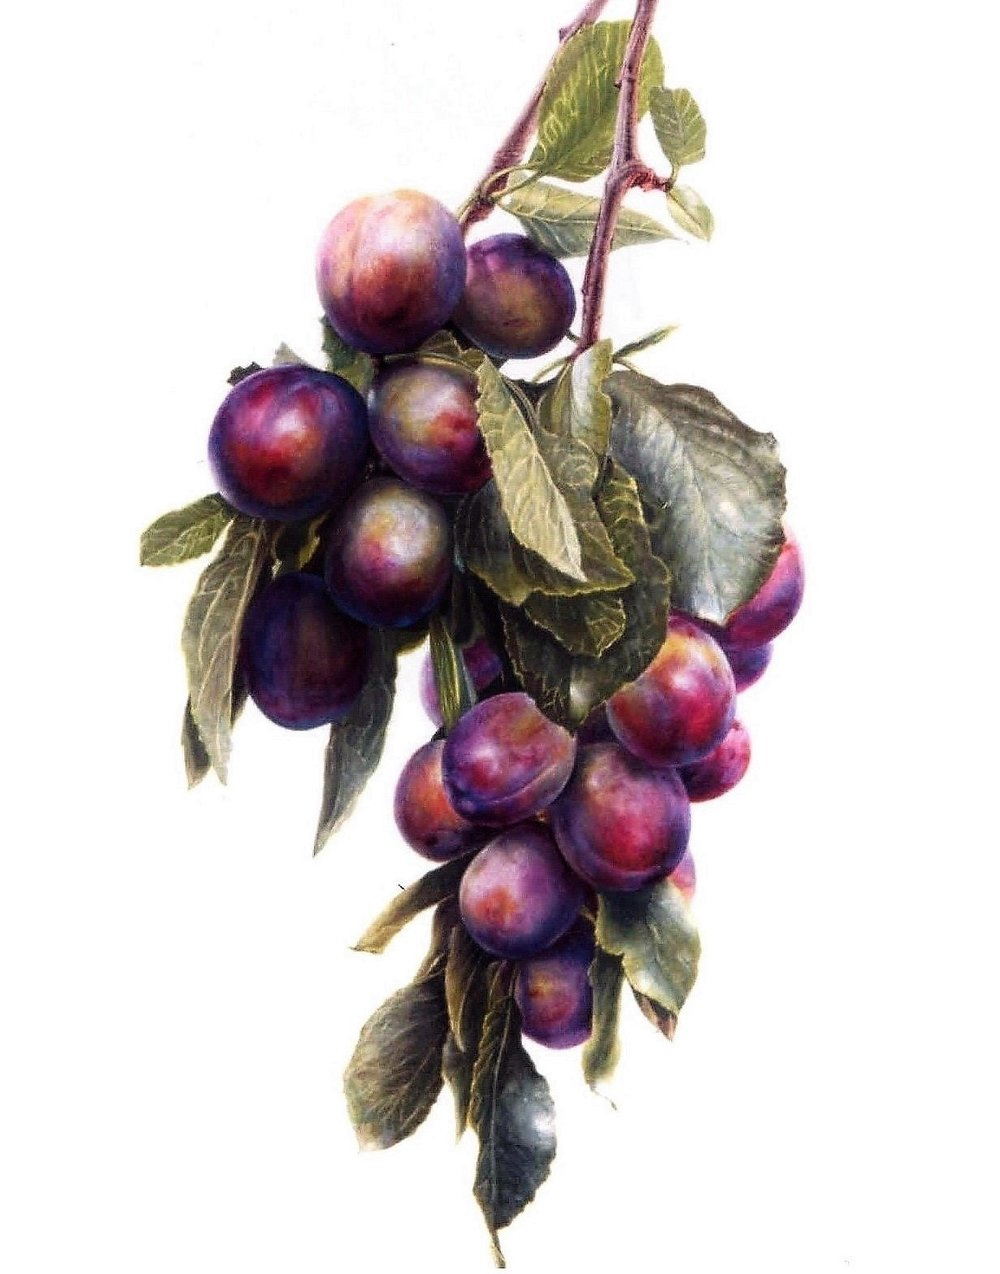 Prunus domestica  'Victoria' Dessert Plum  Watercolour on paper 2005